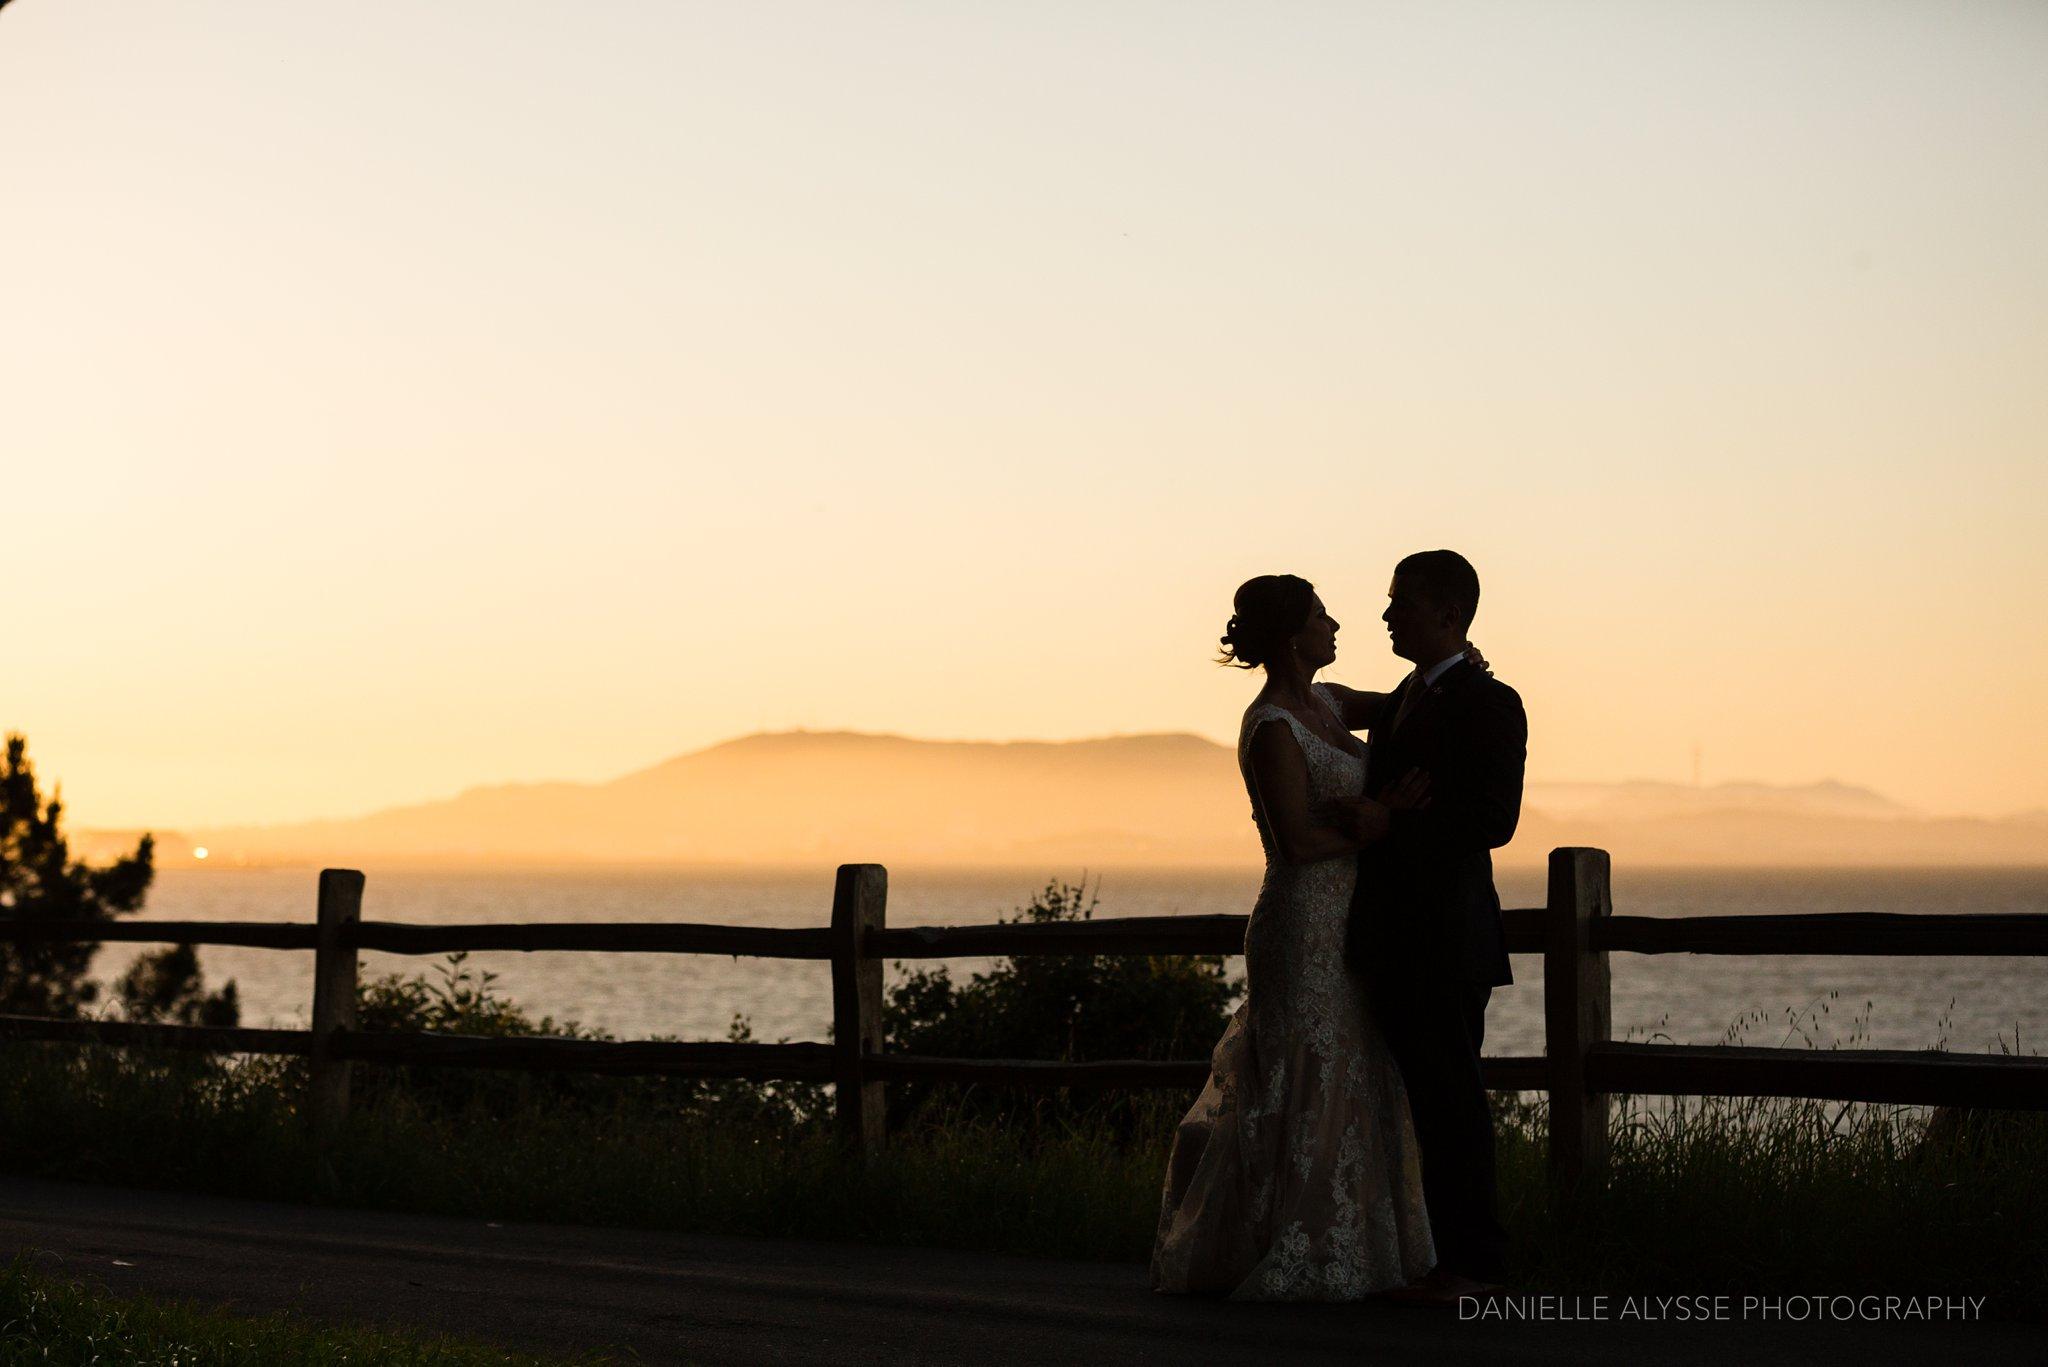 170429_blog_kimberly_ben_wedding_san_mateo_curiodyssey_danielle_alysse_photography_sacramento_photographer0434_WEB.jpg